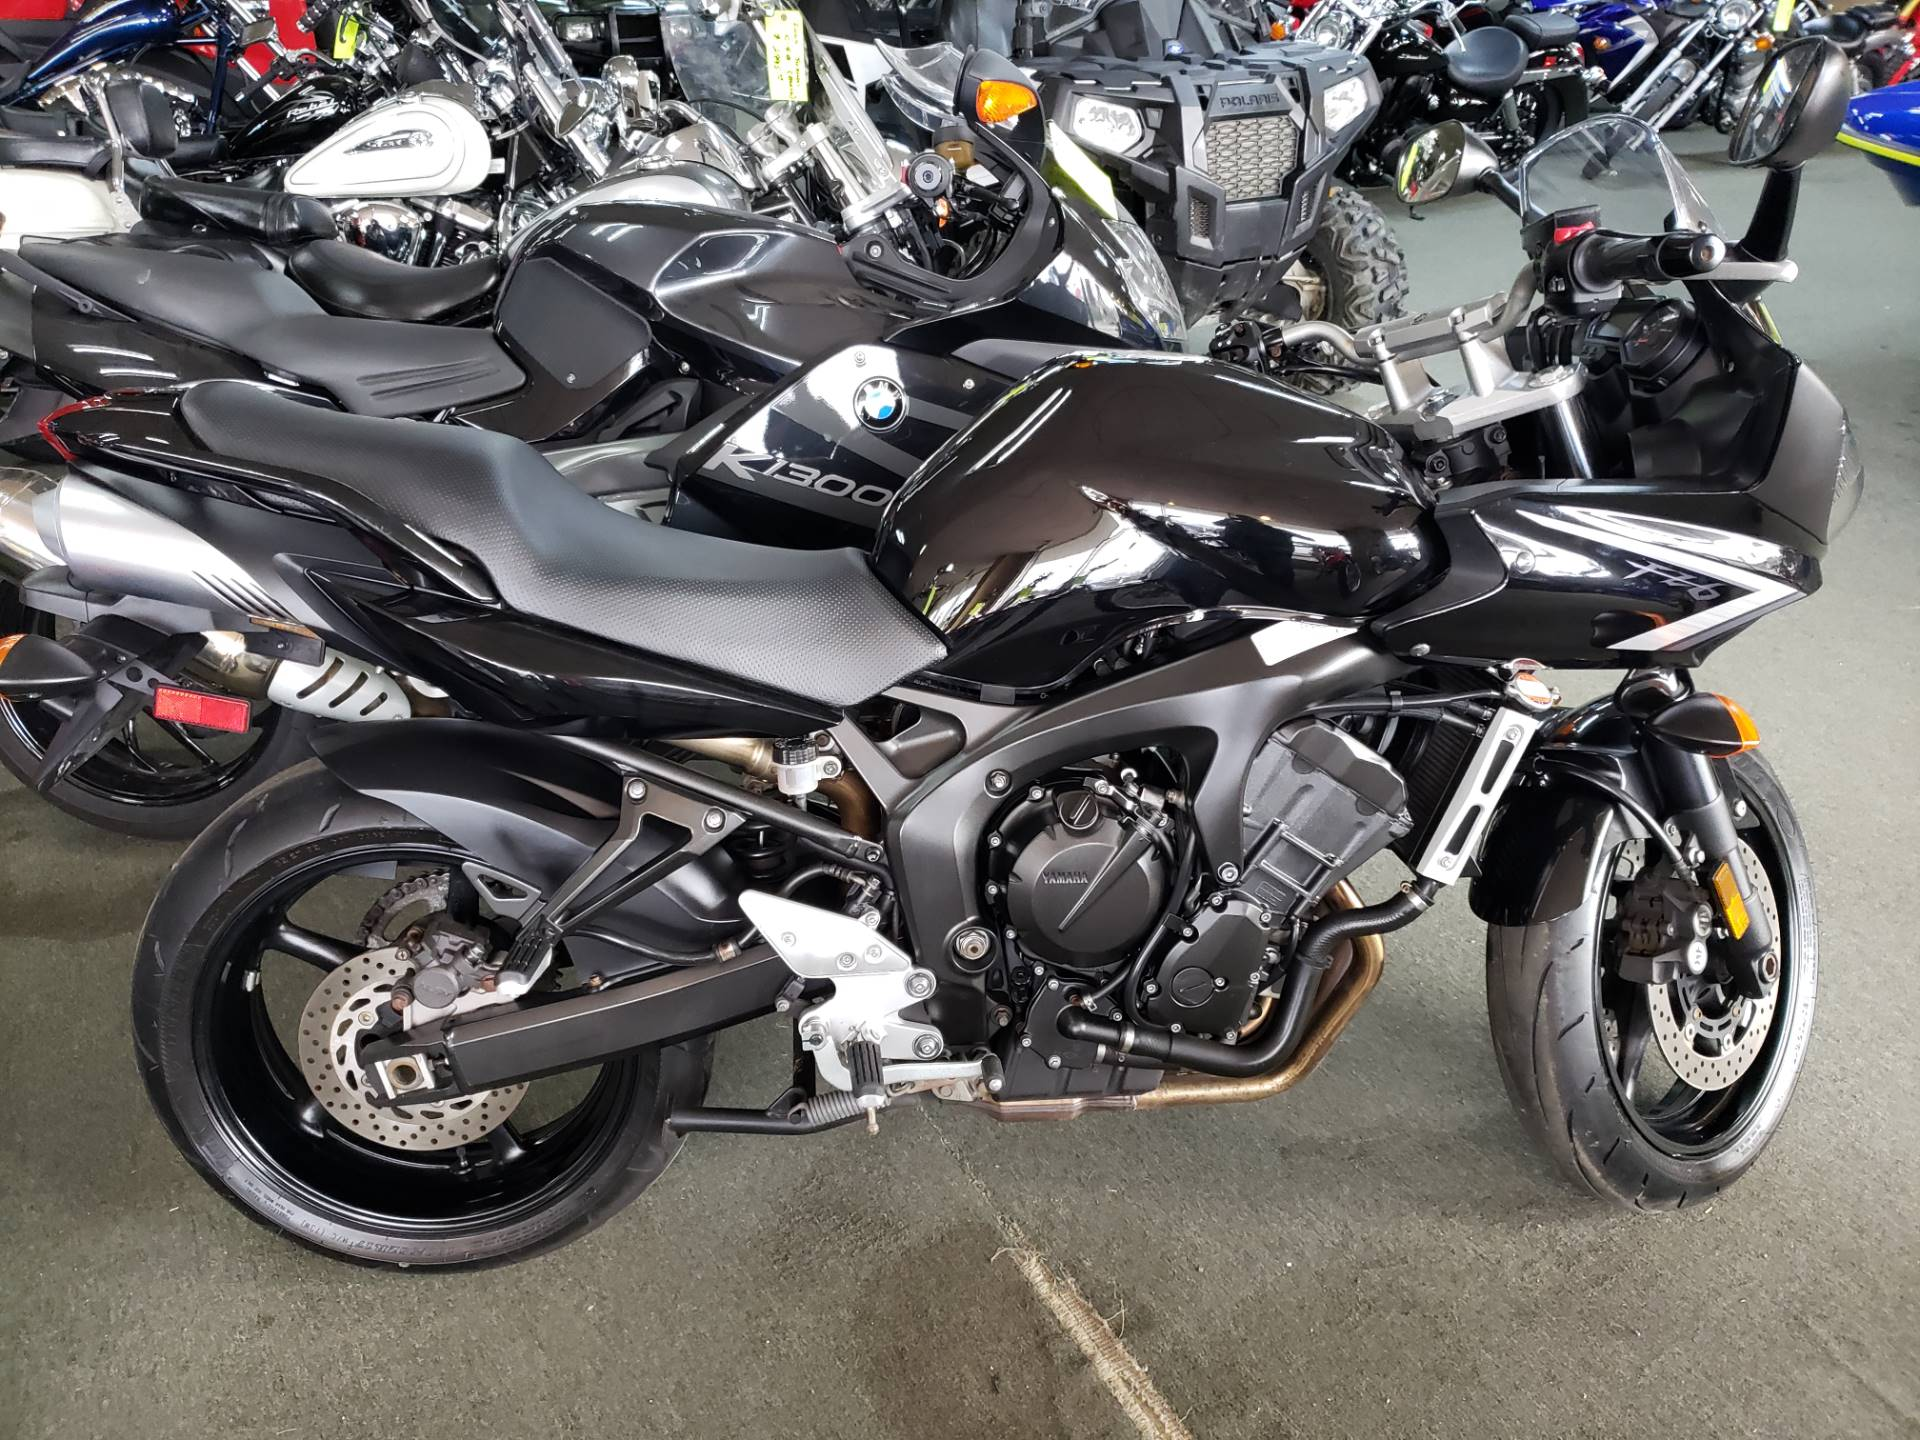 2009 Yamaha FZ6 for sale 5343